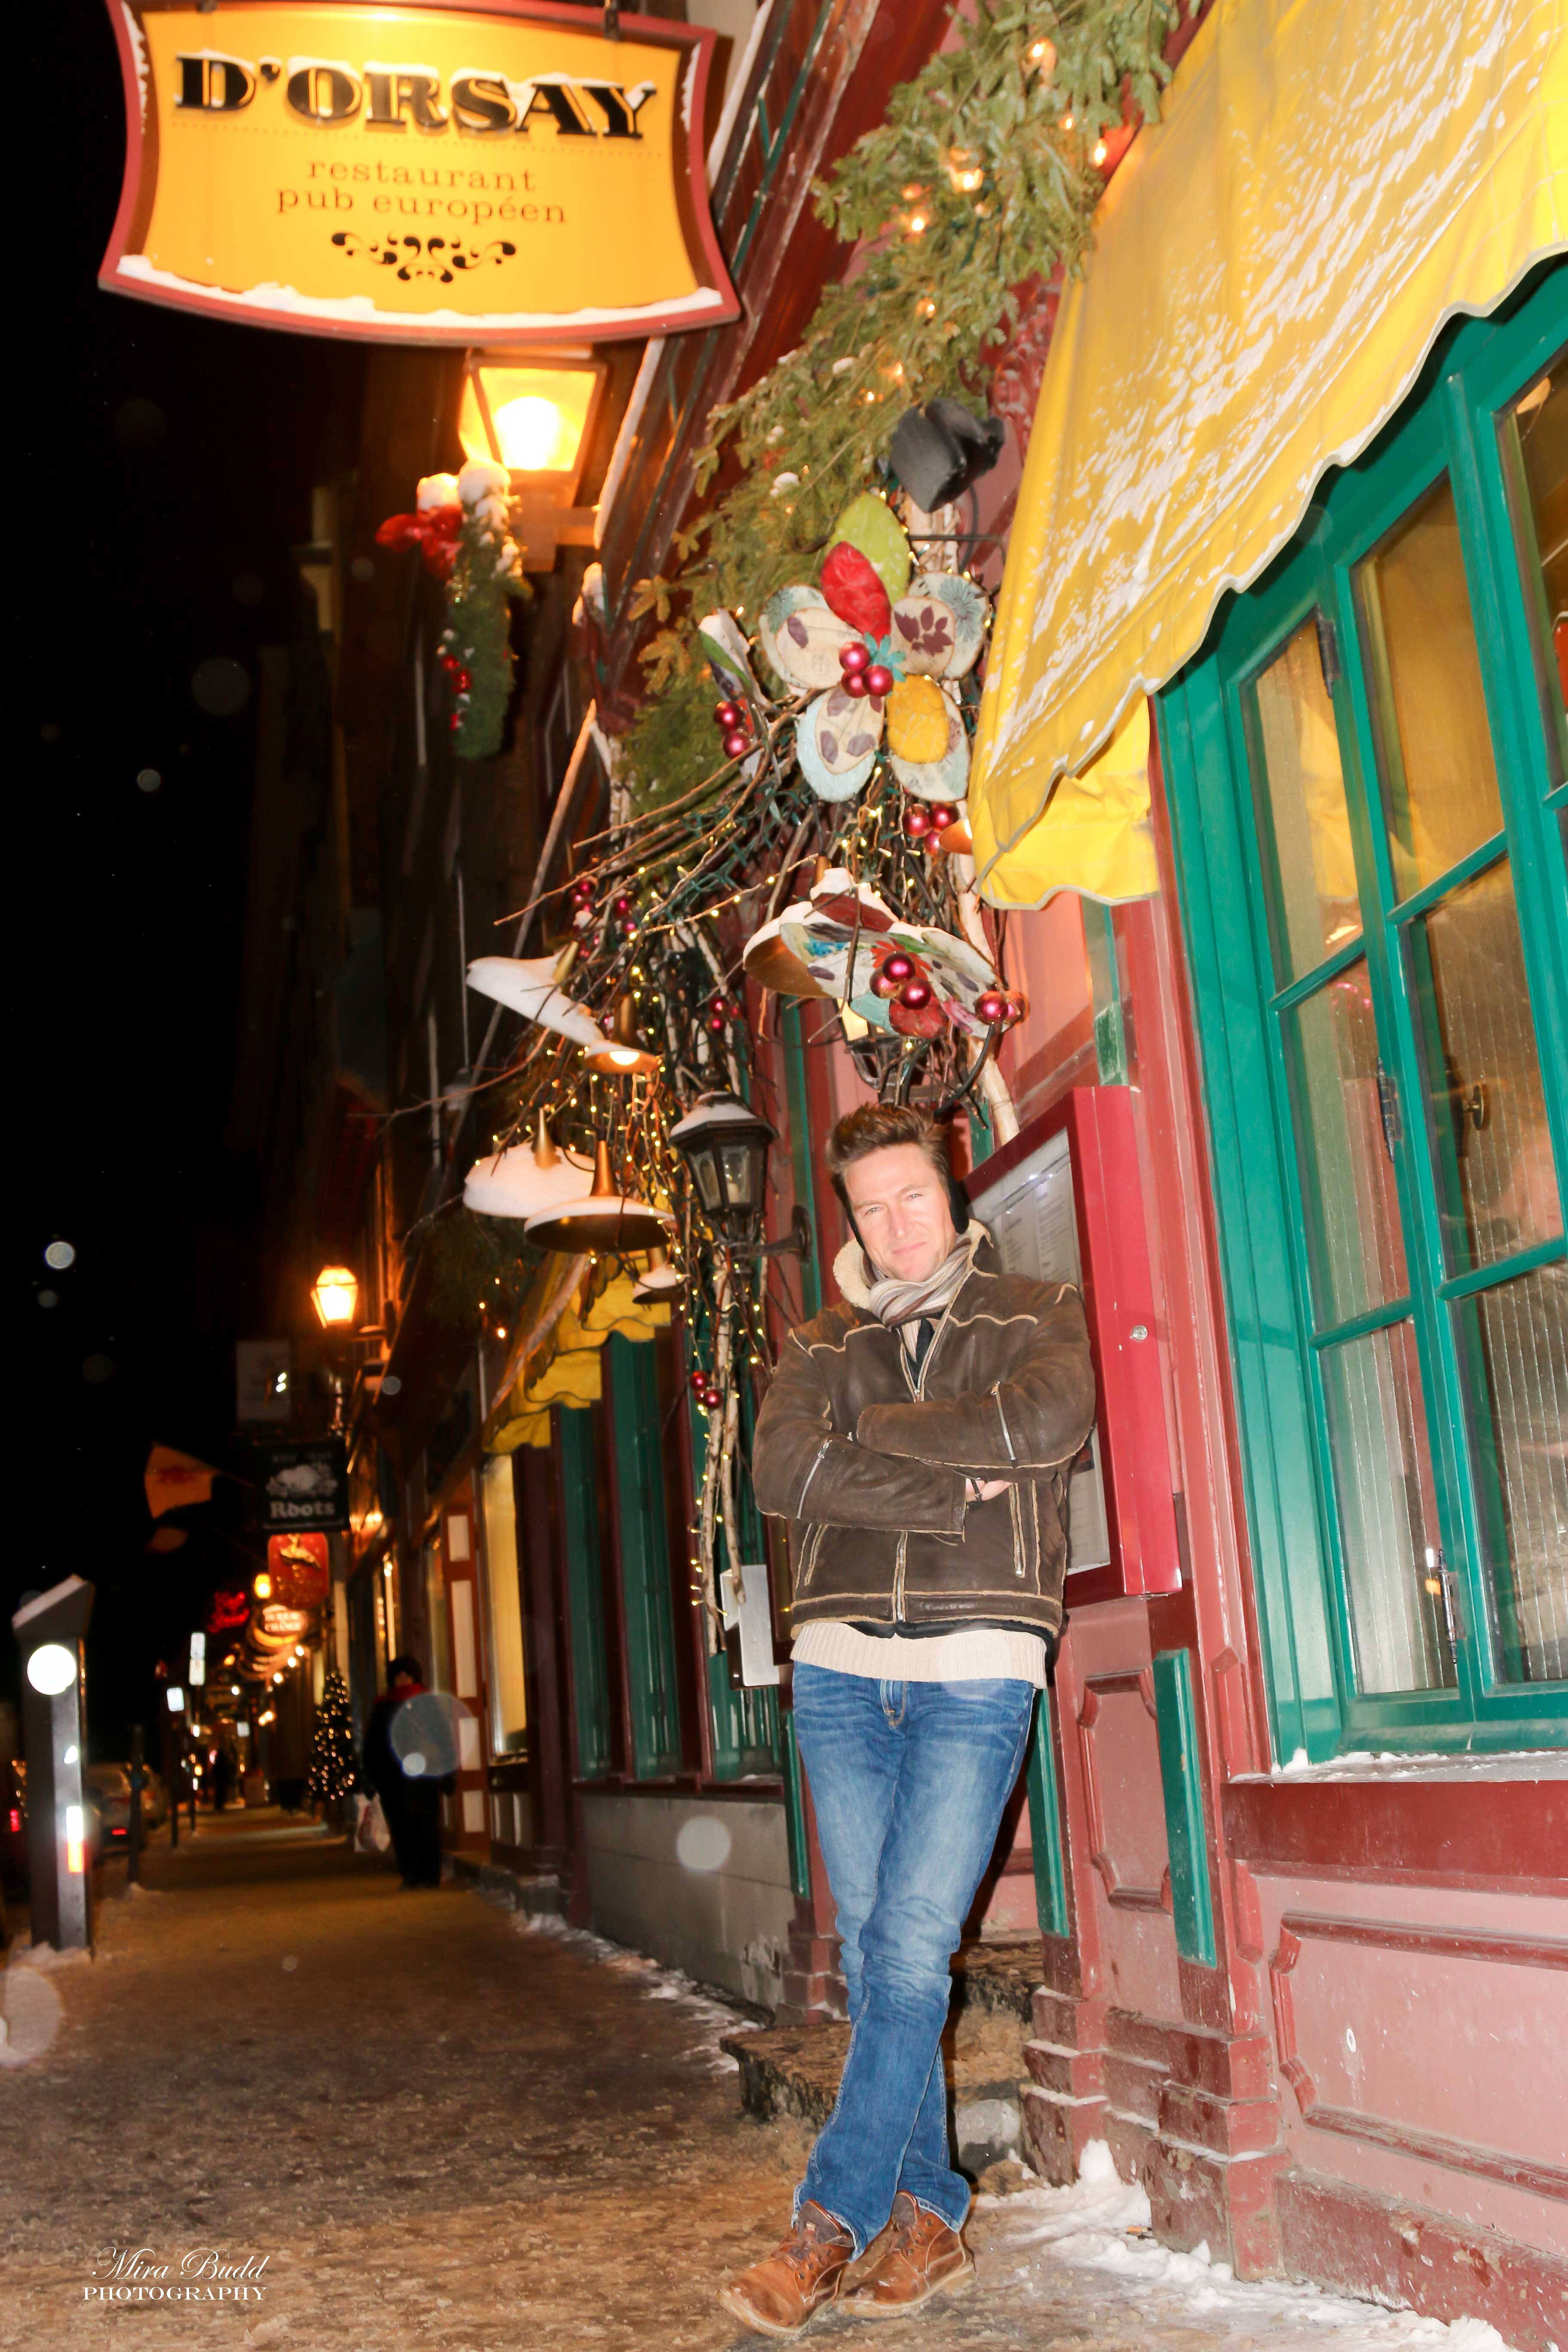 Best Restaurants In Old Quebec Lifeology 101